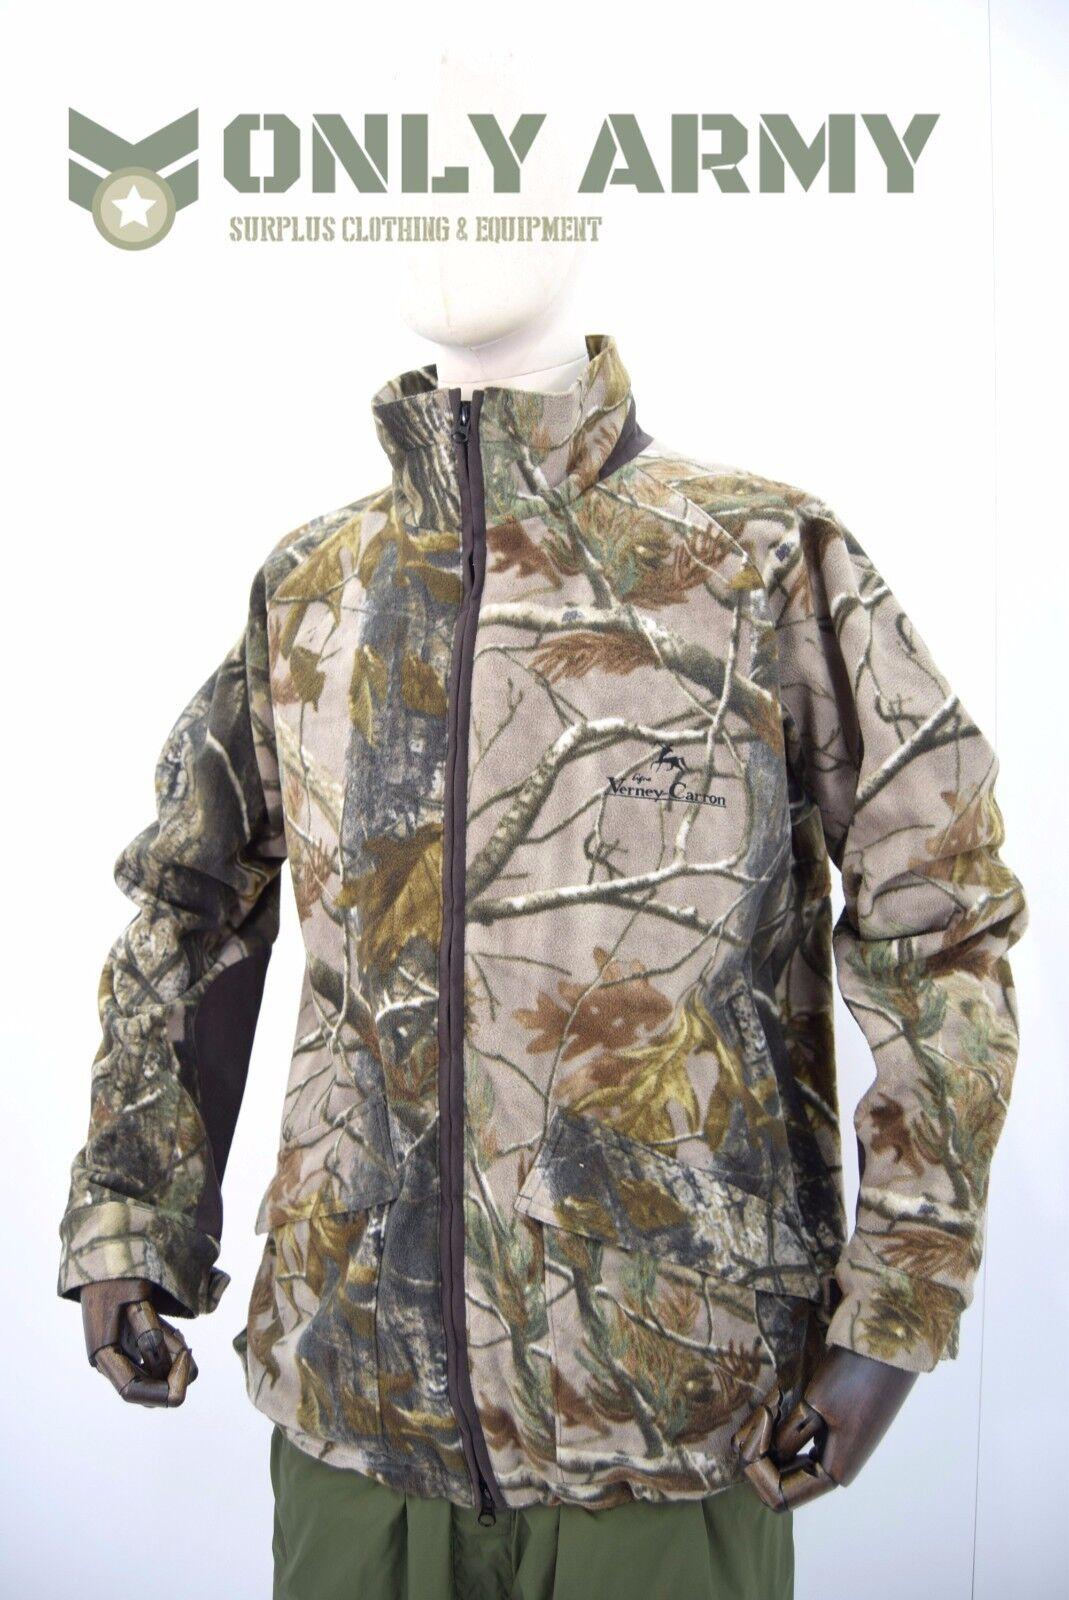 Verney Carron 100% Waterproof Realtree Stalker Fleece Jacket Shooting Stalking